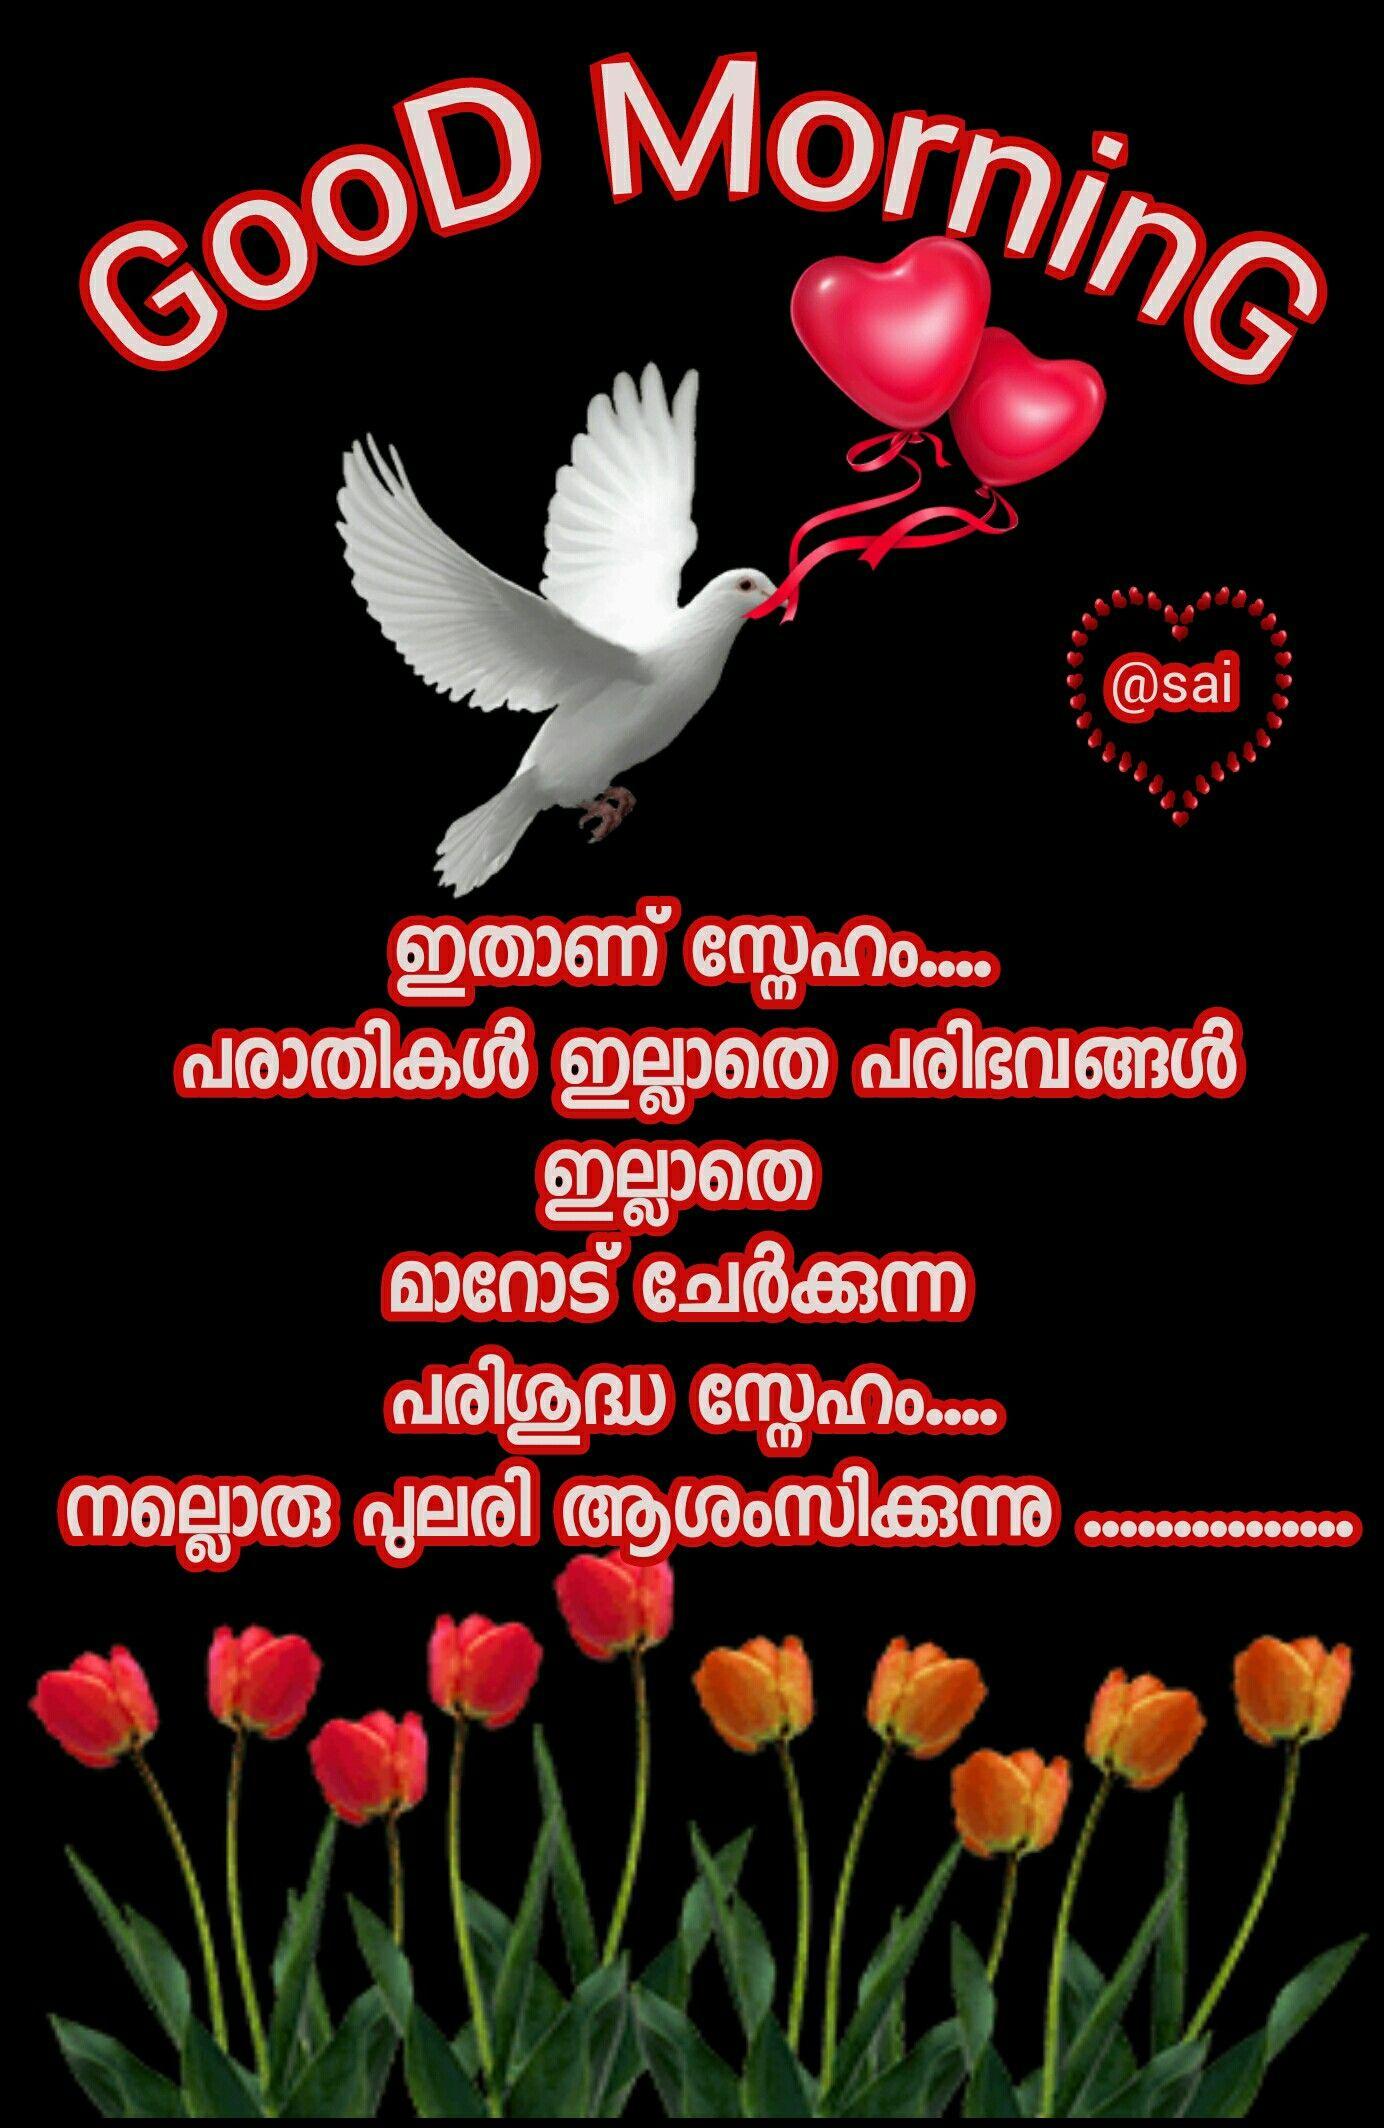 Hai My Dear Molu Morning greetings quotes, Good morning